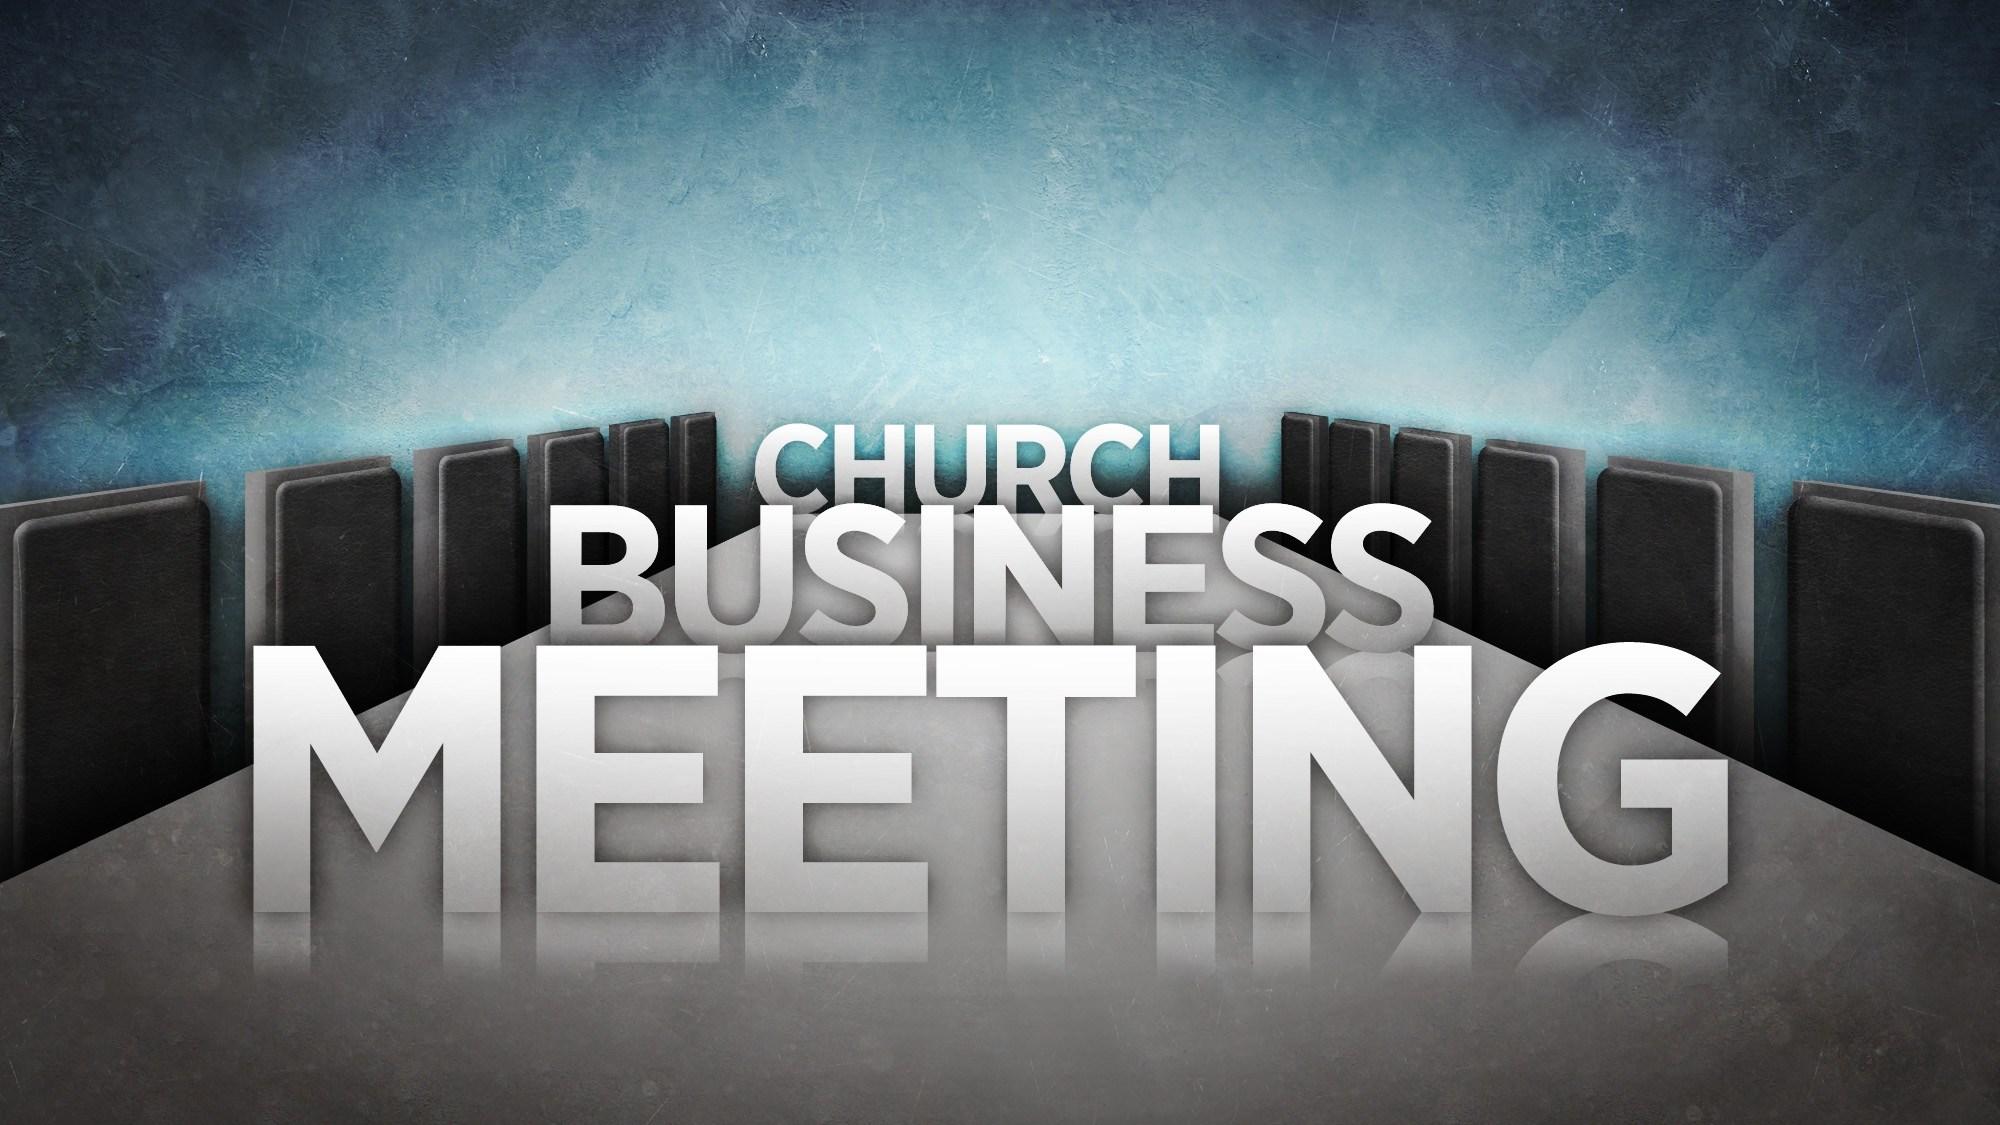 Church business meeting clipart clip art free download Church business meeting clipart 7 » Clipart Portal clip art free download